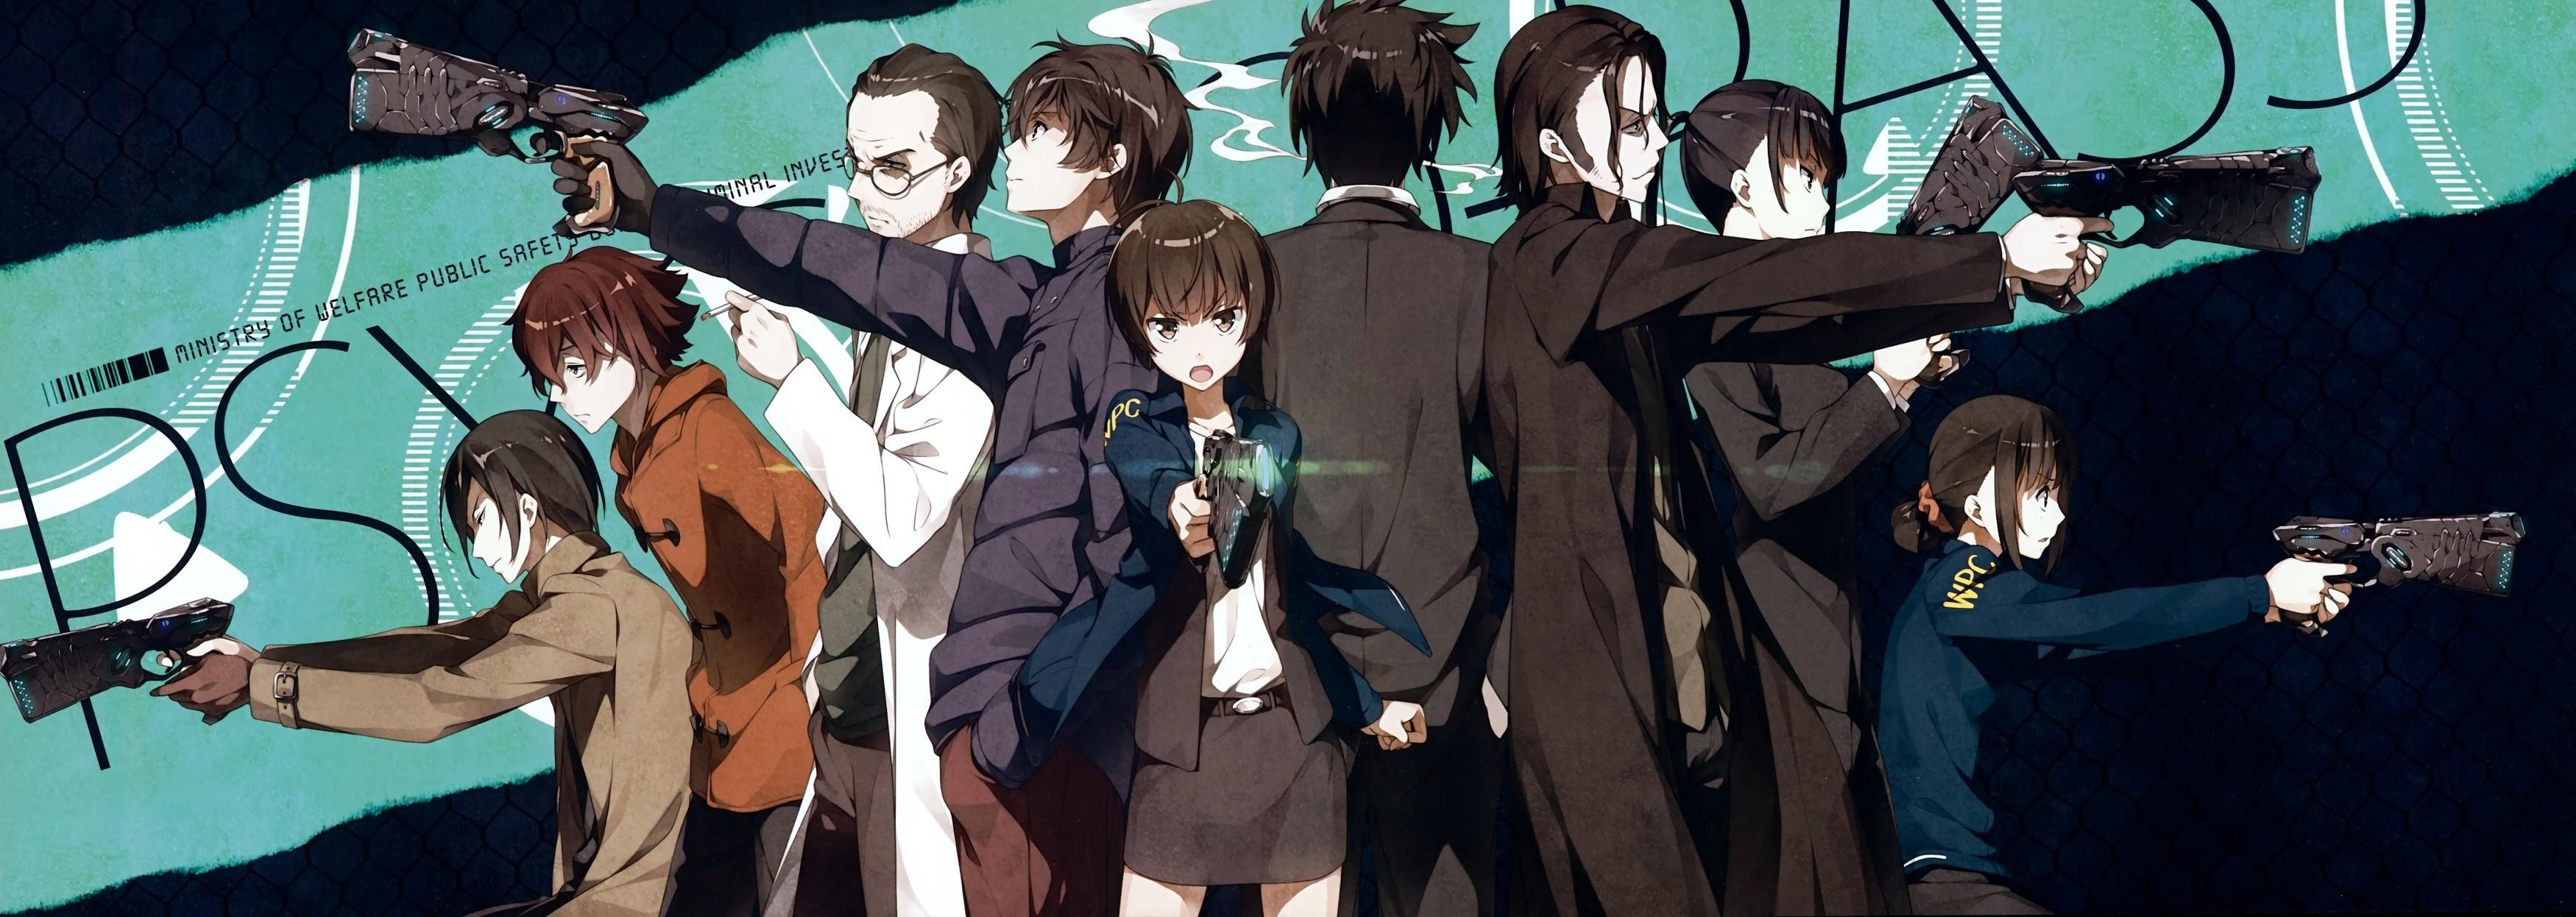 HD Wallpaper | Background ID:670943. Anime Psycho-Pass